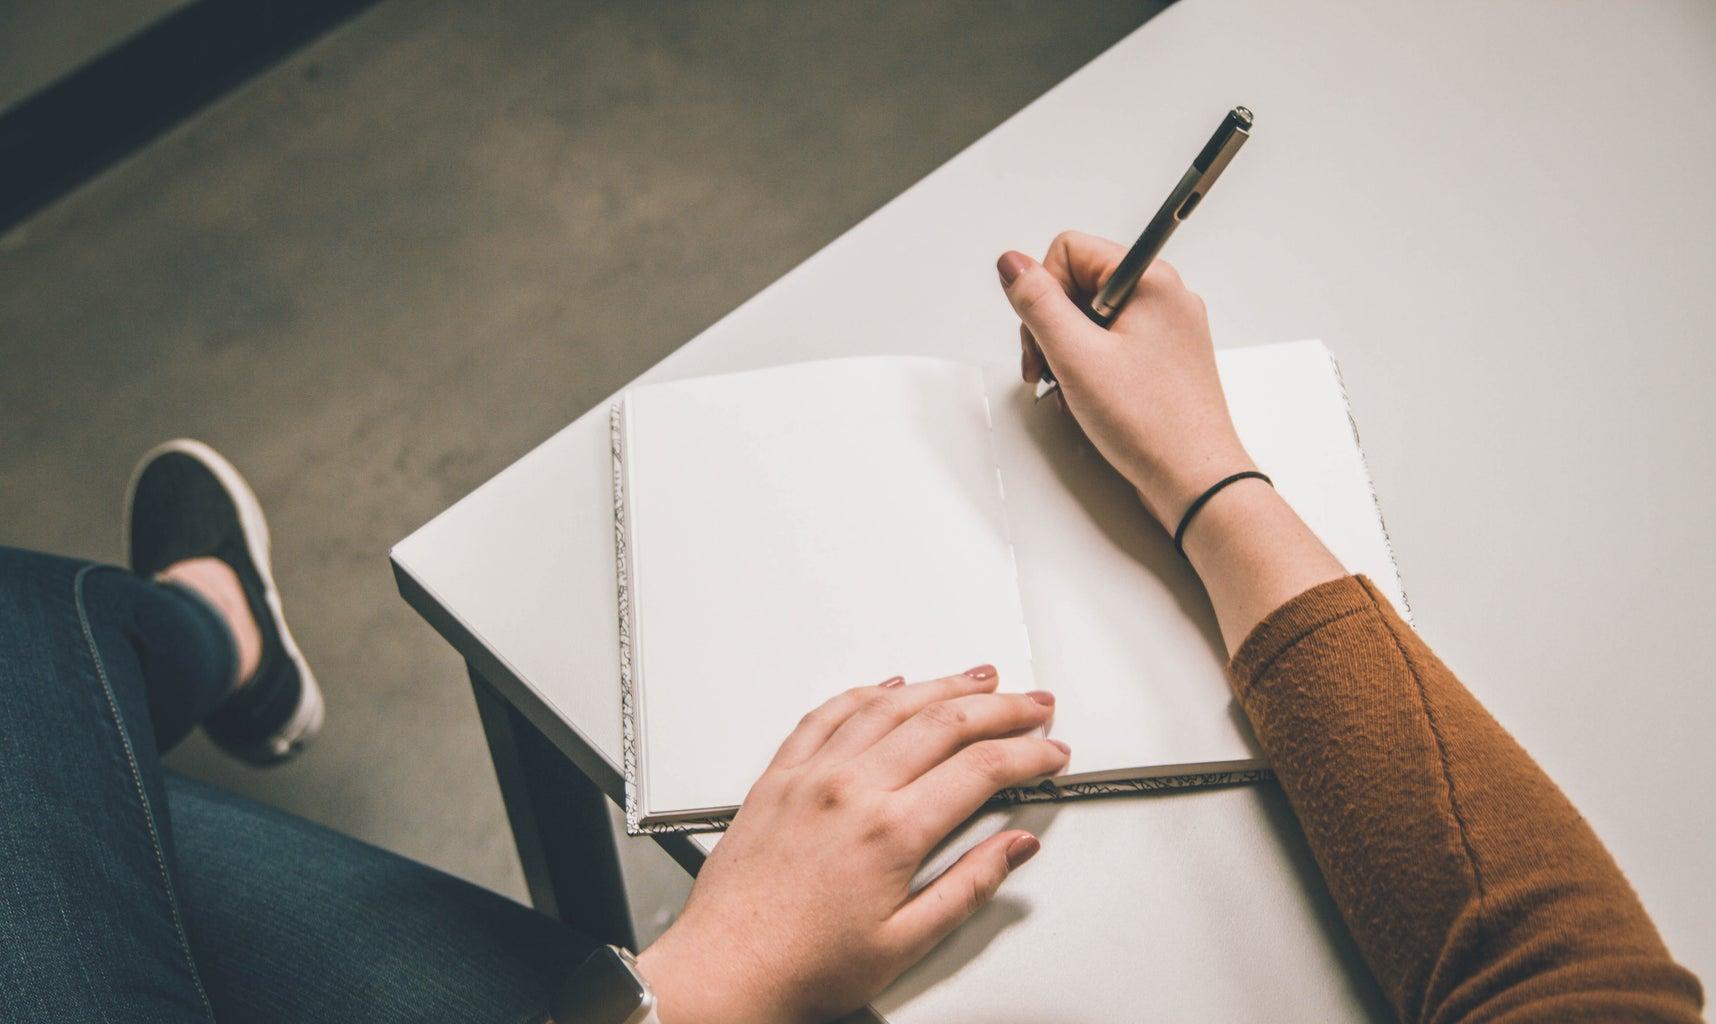 writing in journal on desk